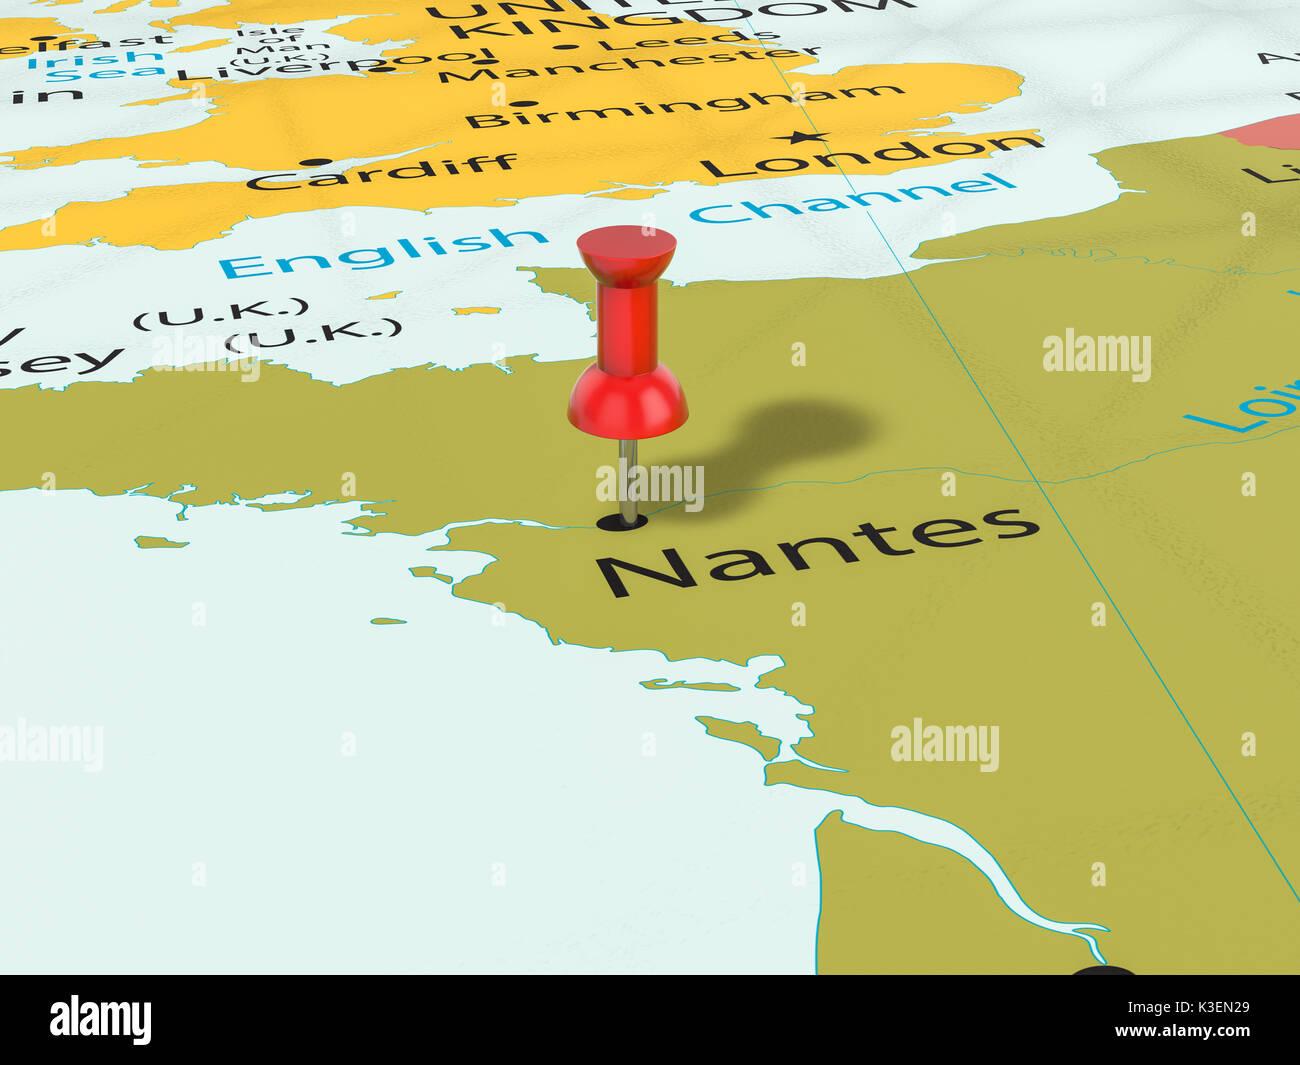 Nantes Karte.Stecknadel Auf Nantes Karte Hintergrund 3d Darstellung Stockfoto